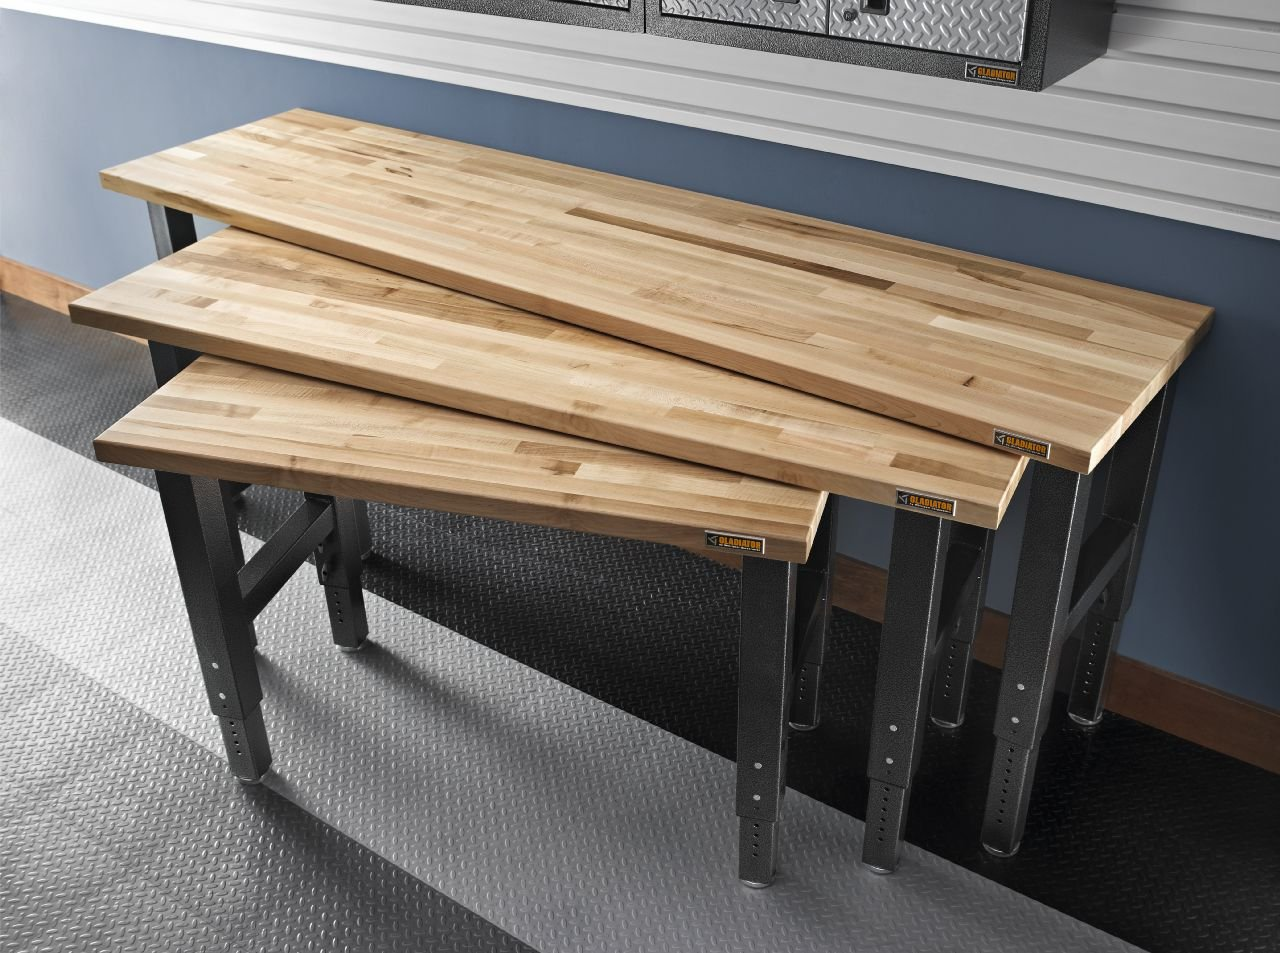 4' Adjustable Height Hardwood Workbench with Hammered Granite Finish